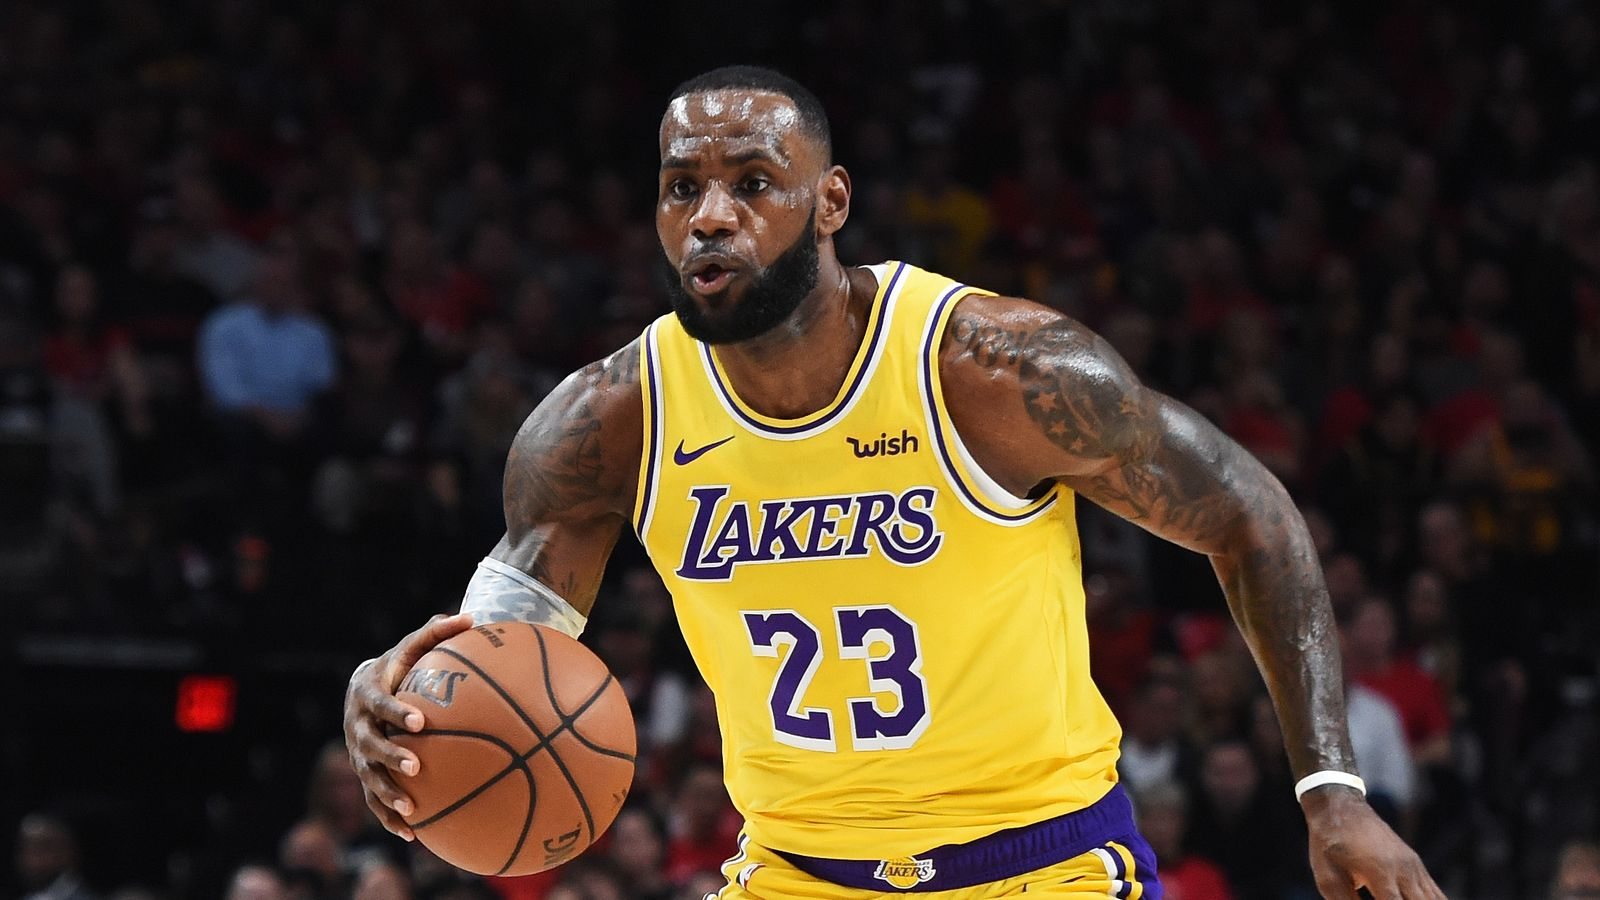 Nba Basketball Los Angeles Lakers: Lebron James: Basketball Superstar Loses In Portland In LA